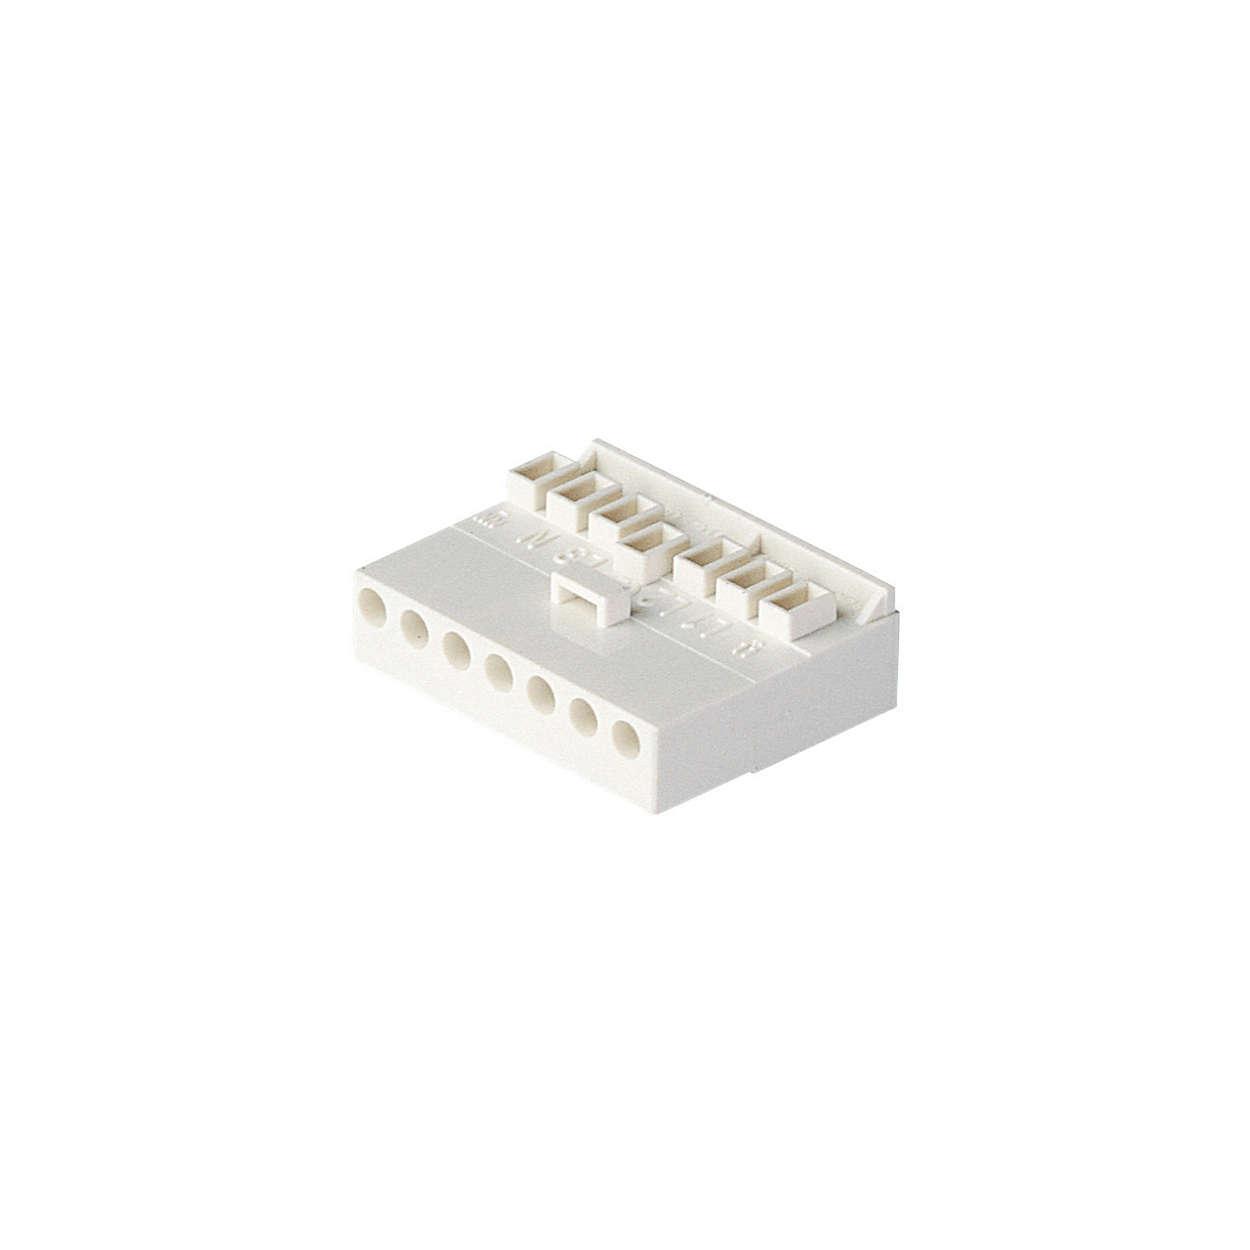 9MX056 TL-D / TL5 шарнирное устройство